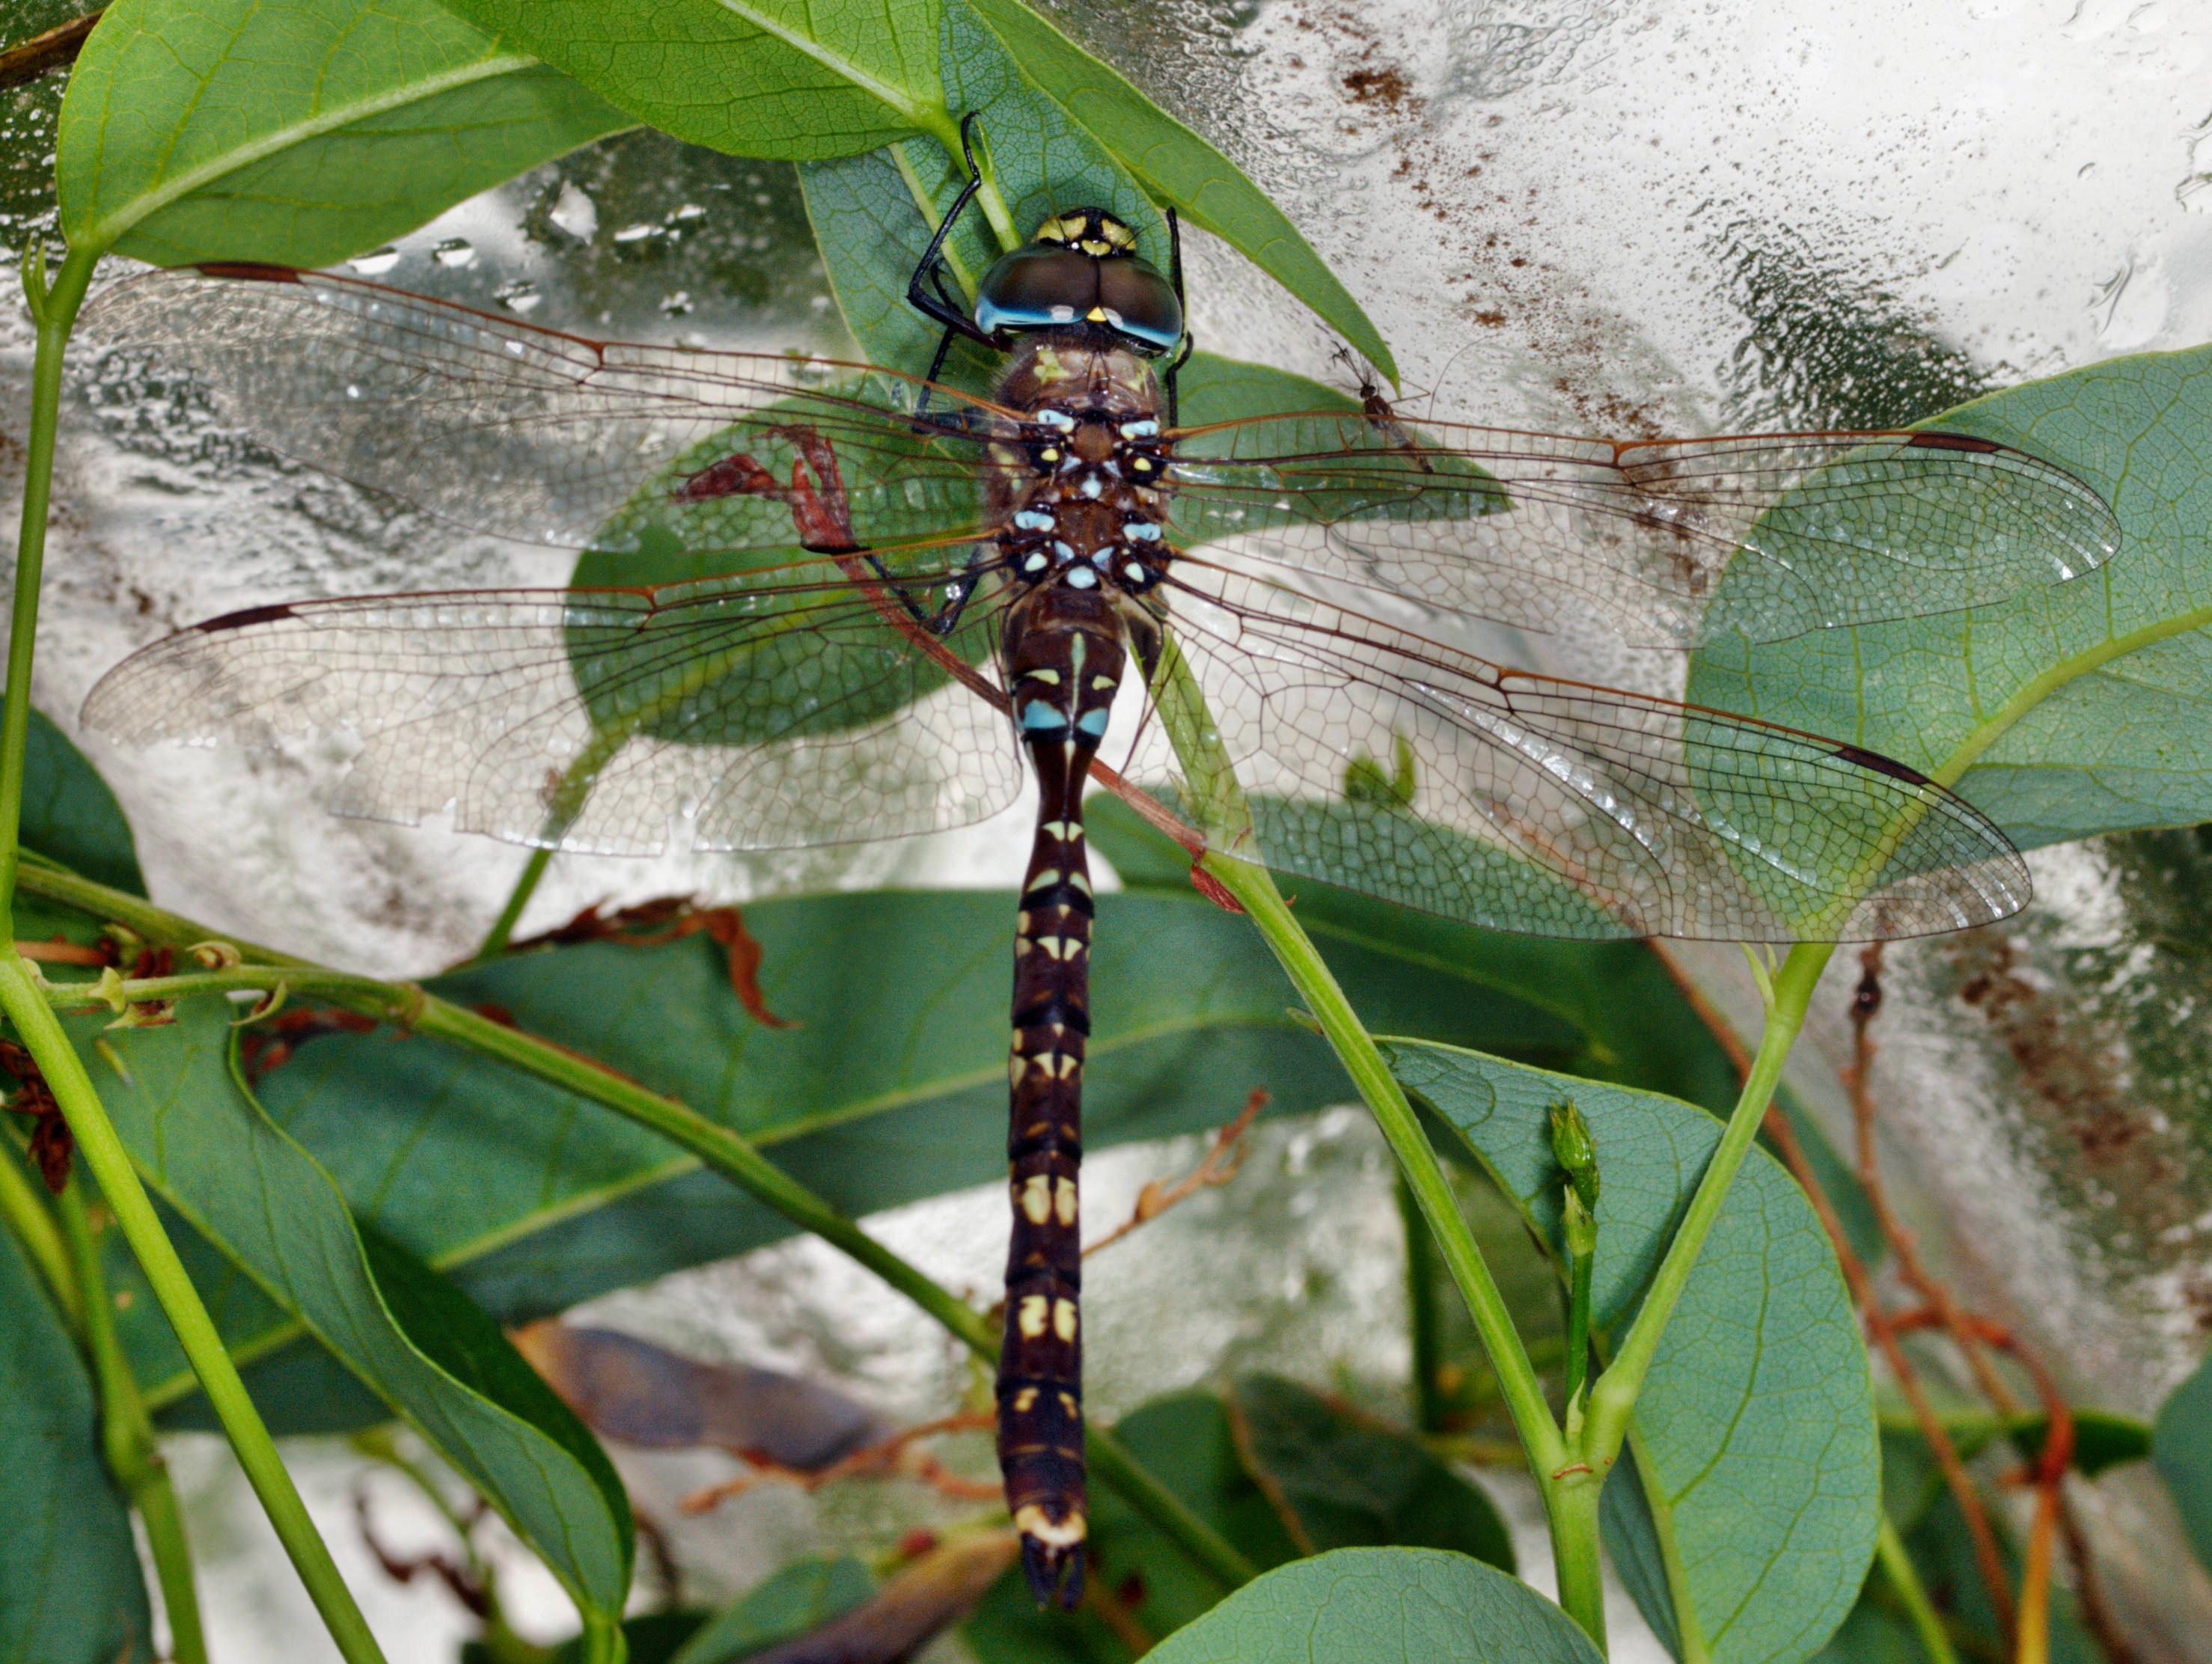 Dragonfly-2.jpeg